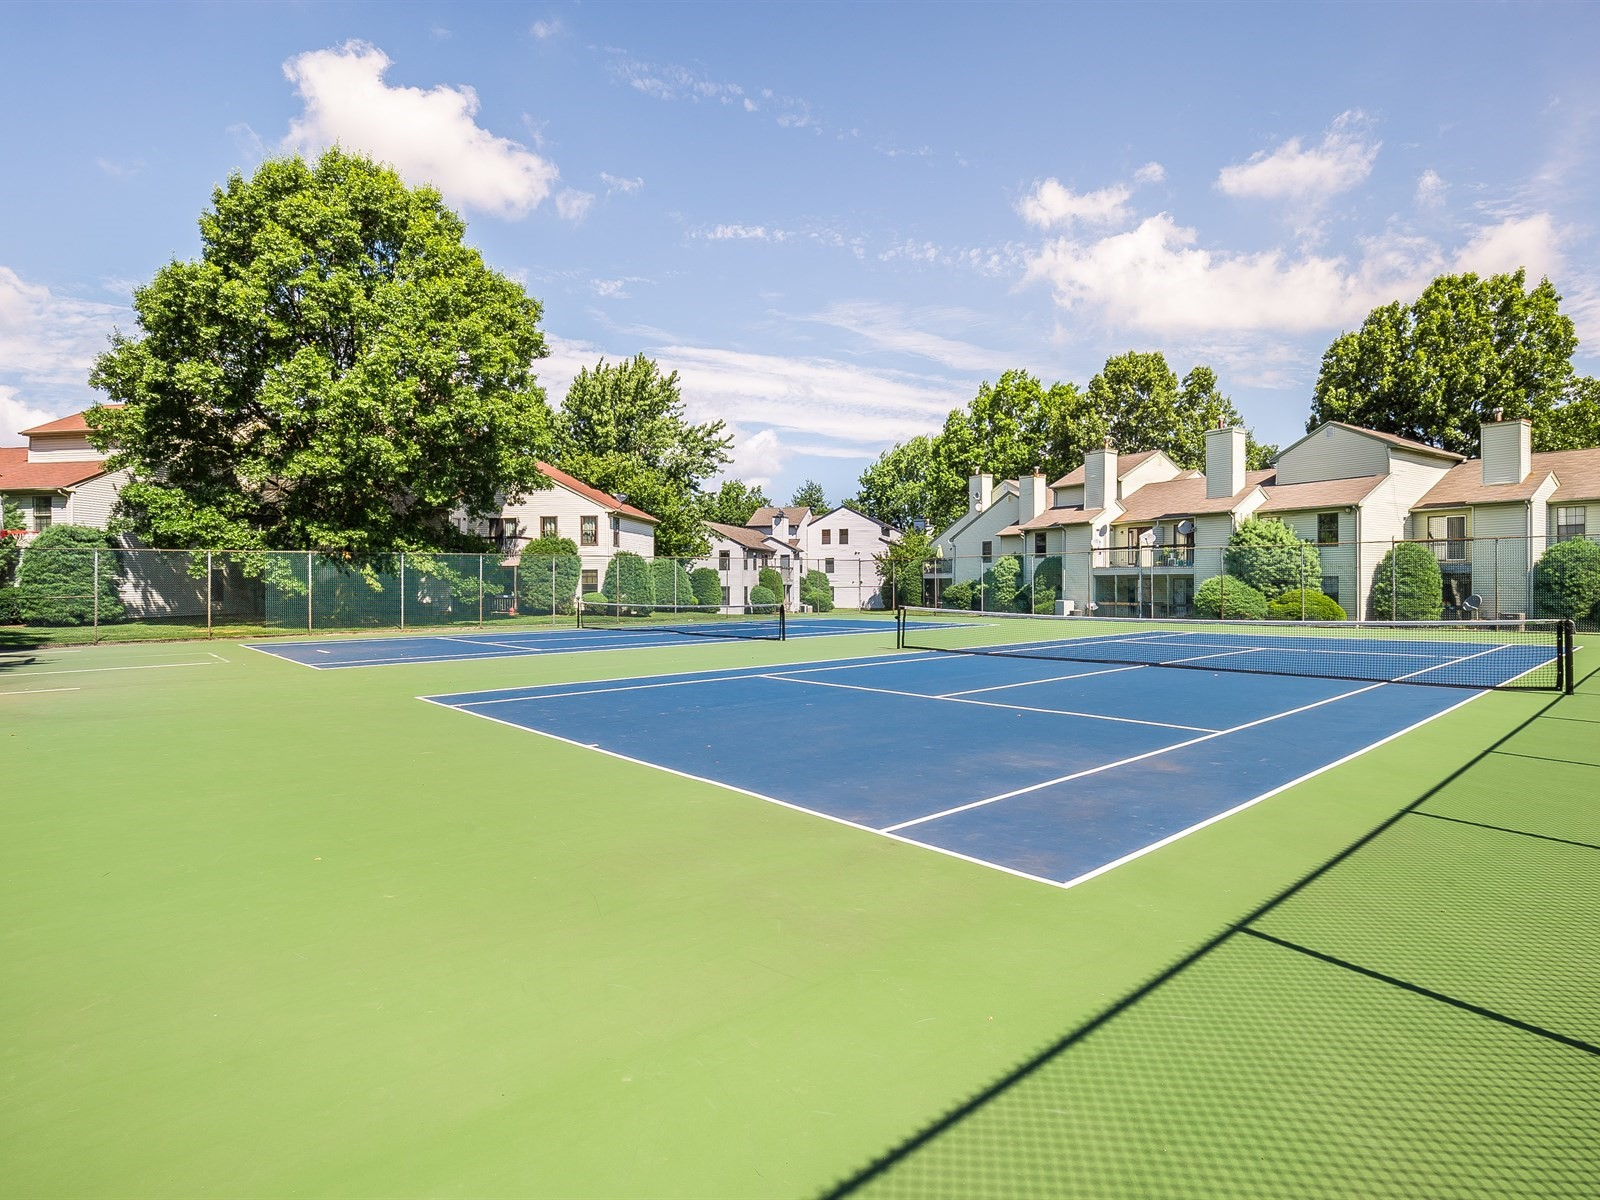 Woodbridge 404 Furnished Apartment complex tennis courts